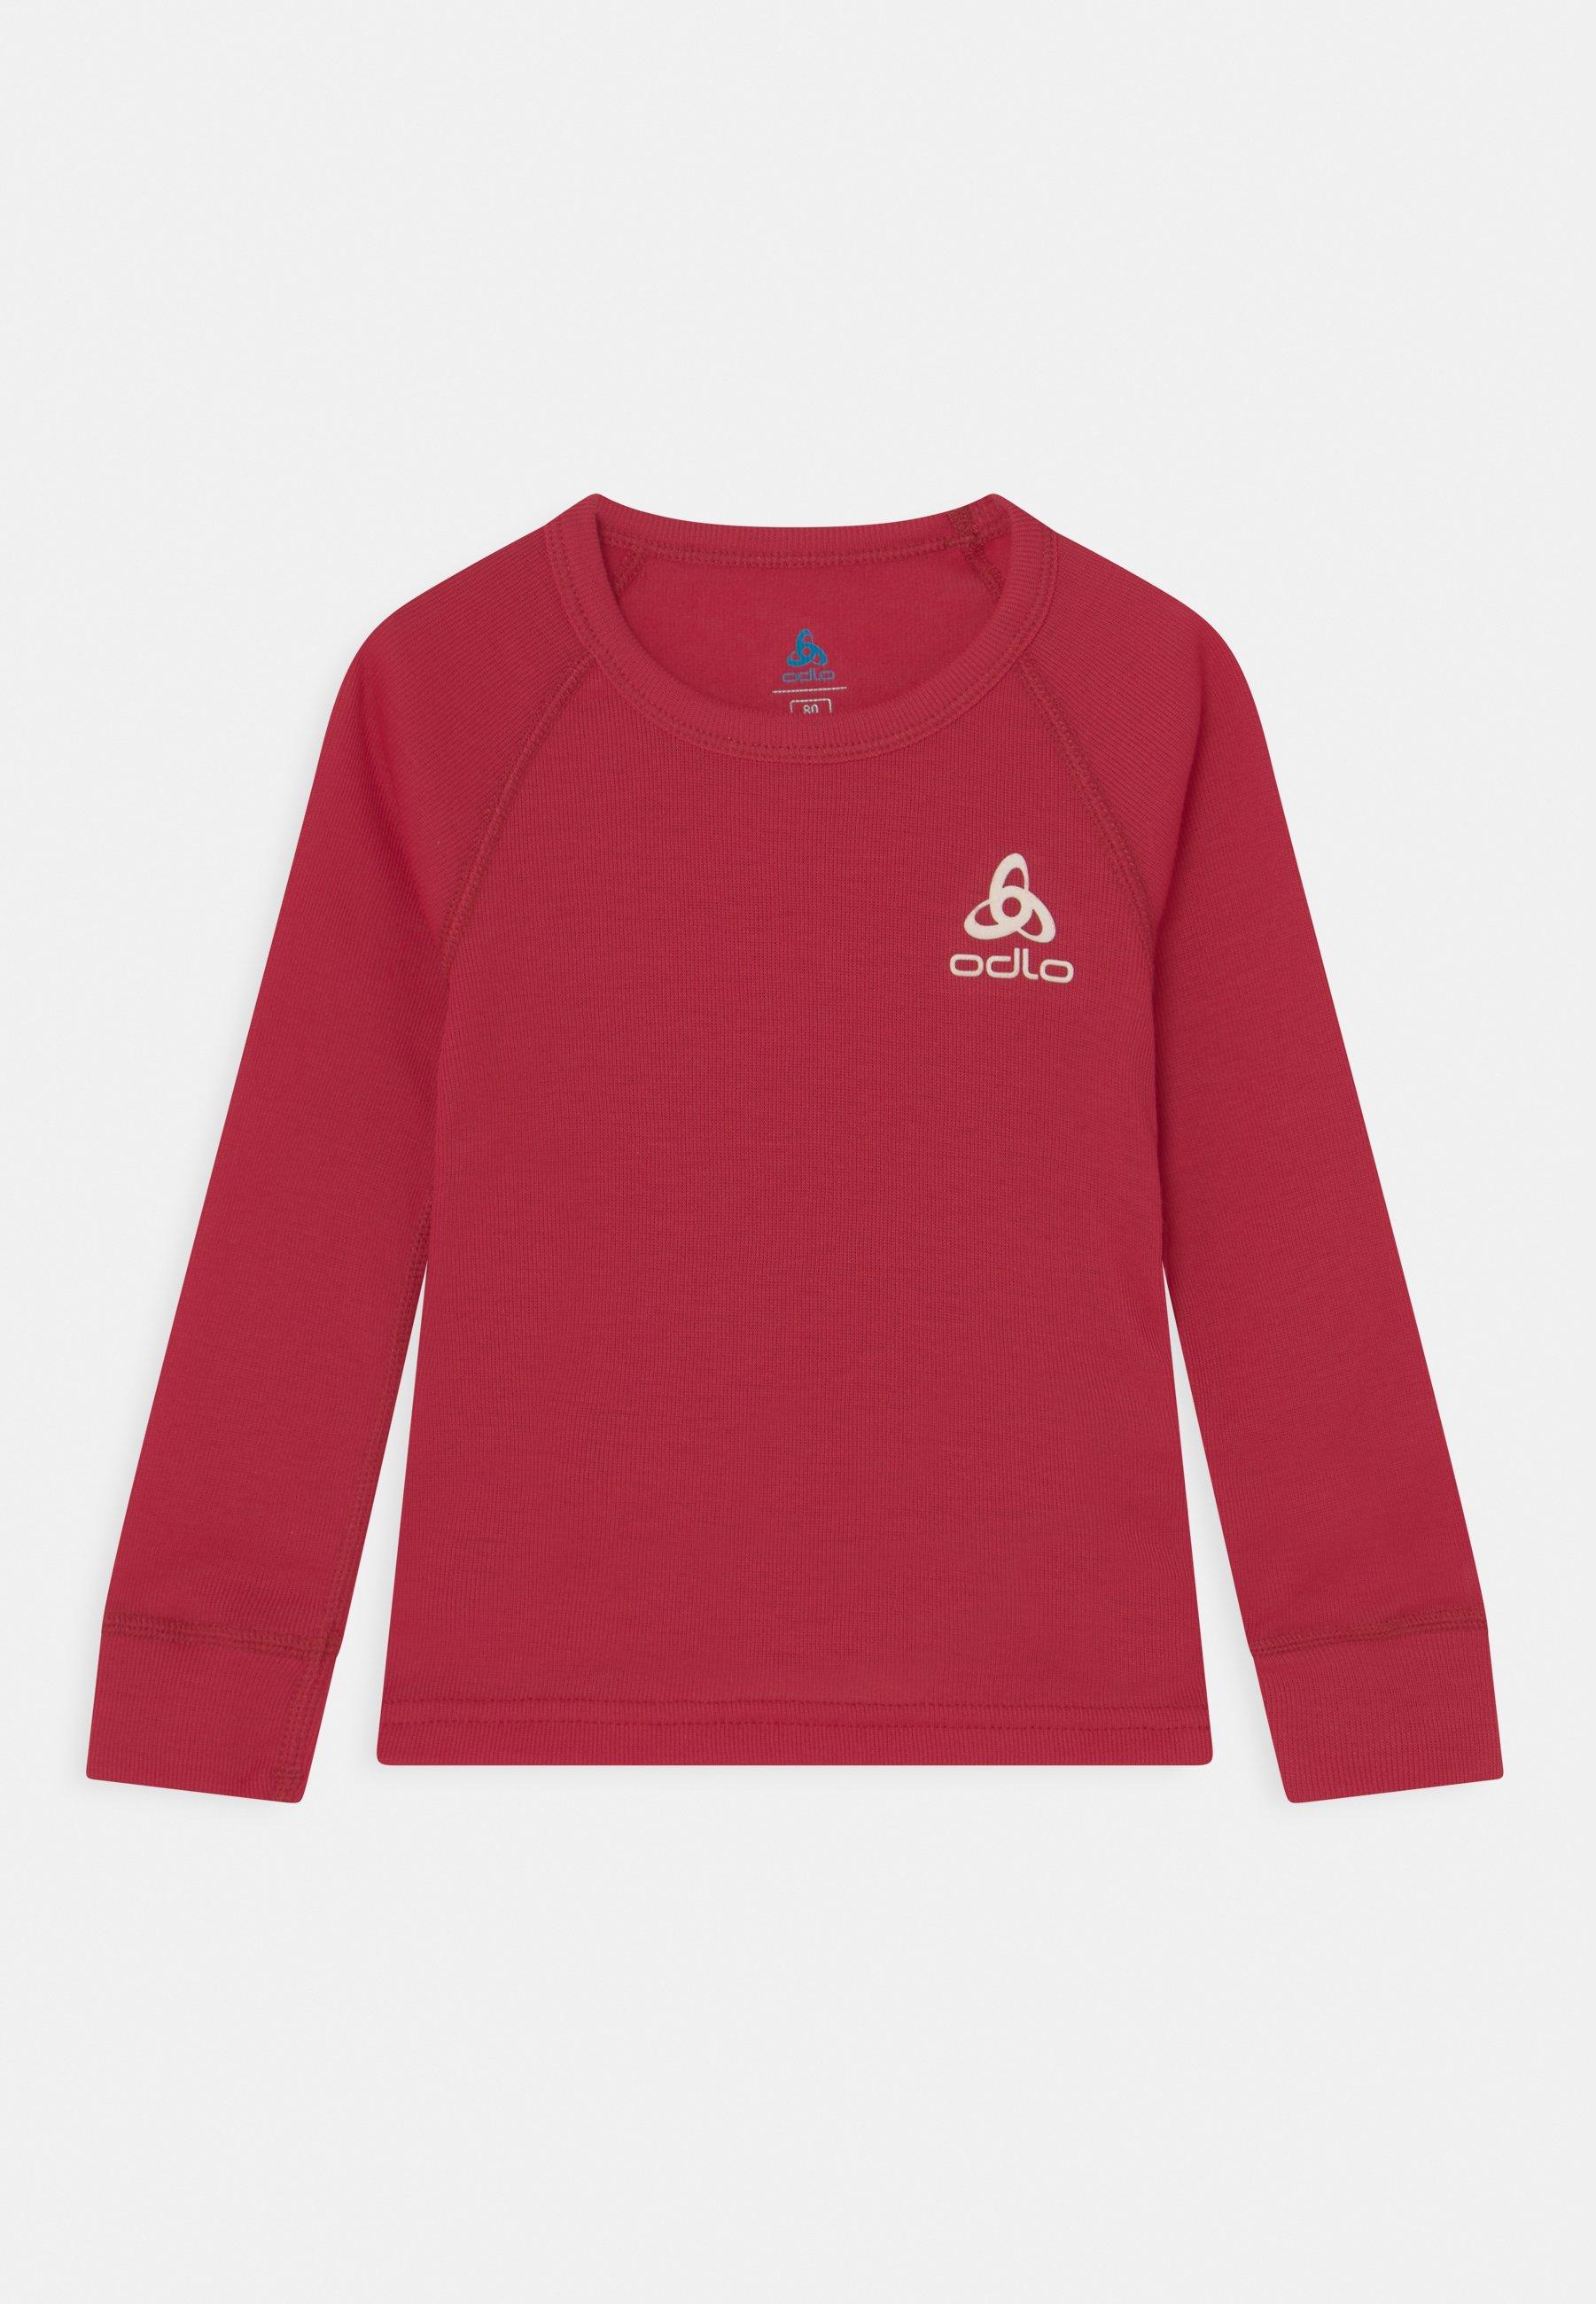 Kinder CREW NECK ACTIVE WARM ECO UNISEX - Unterhemd/-shirt